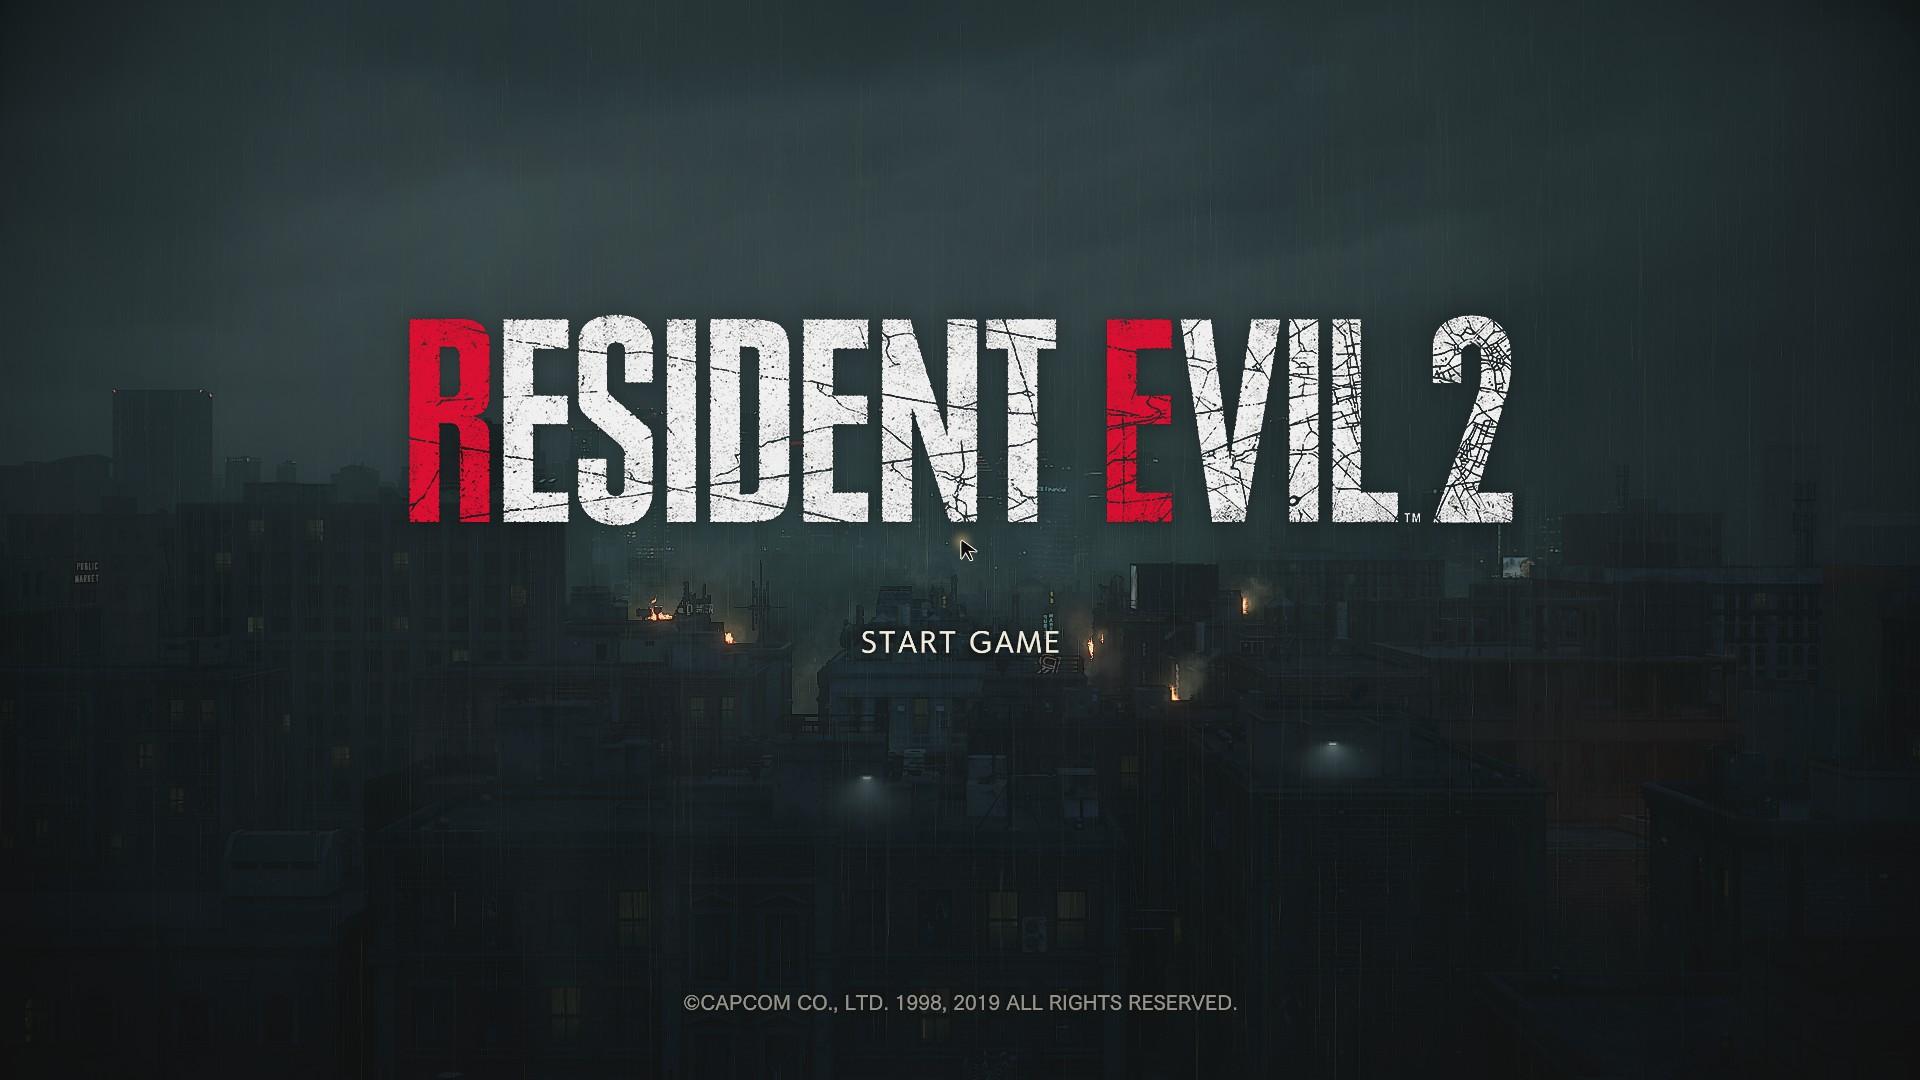 Resident Evil 2 Remake Tips and Tricks for Beginners